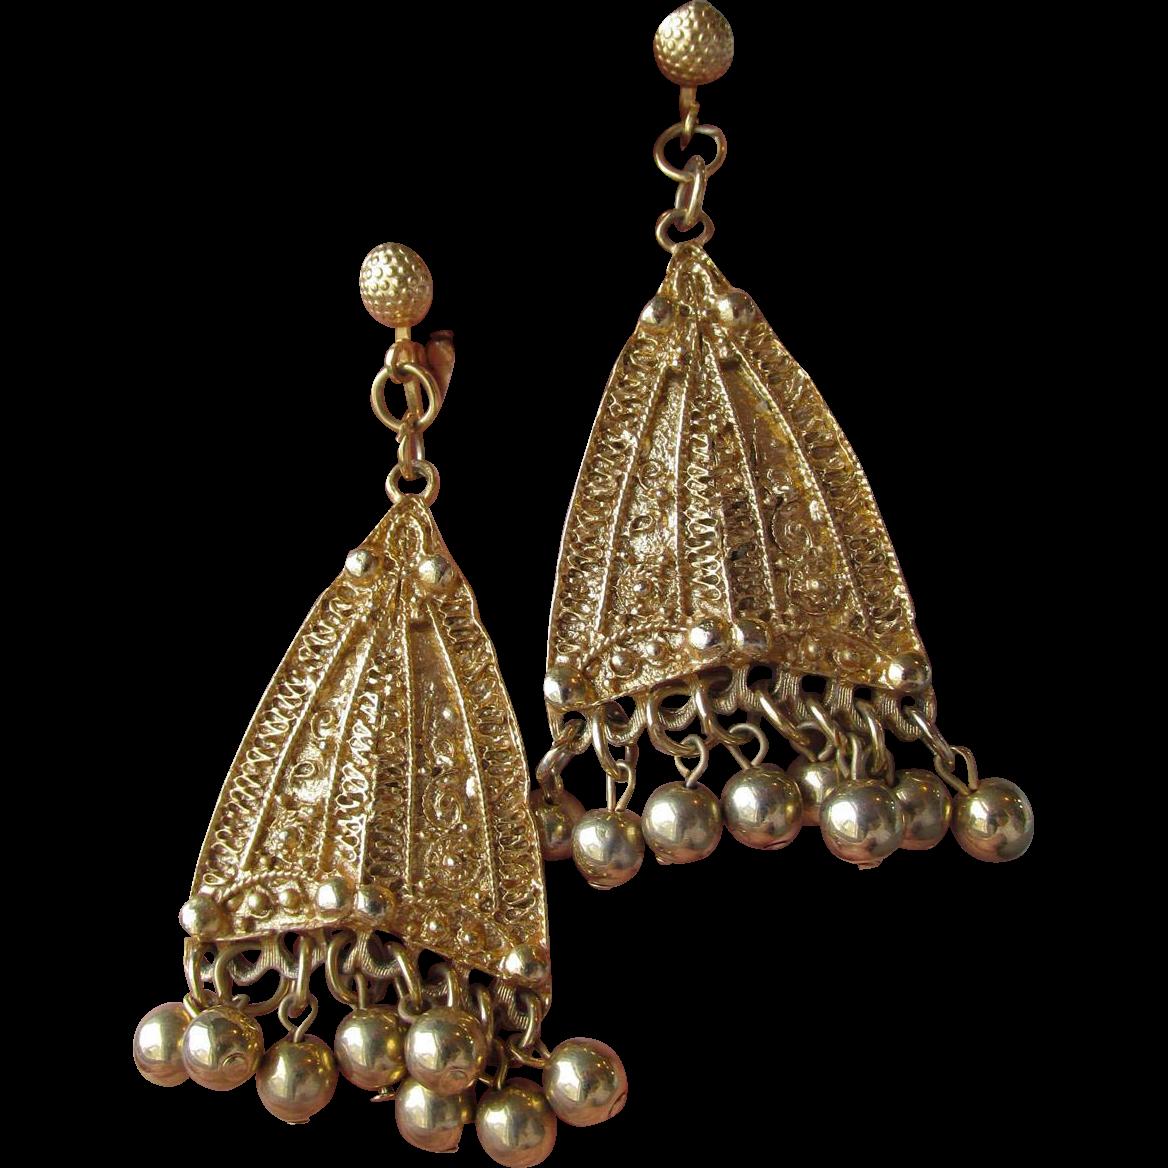 Vintage 1960's BIG Etruscan Revival Dangle Earrings